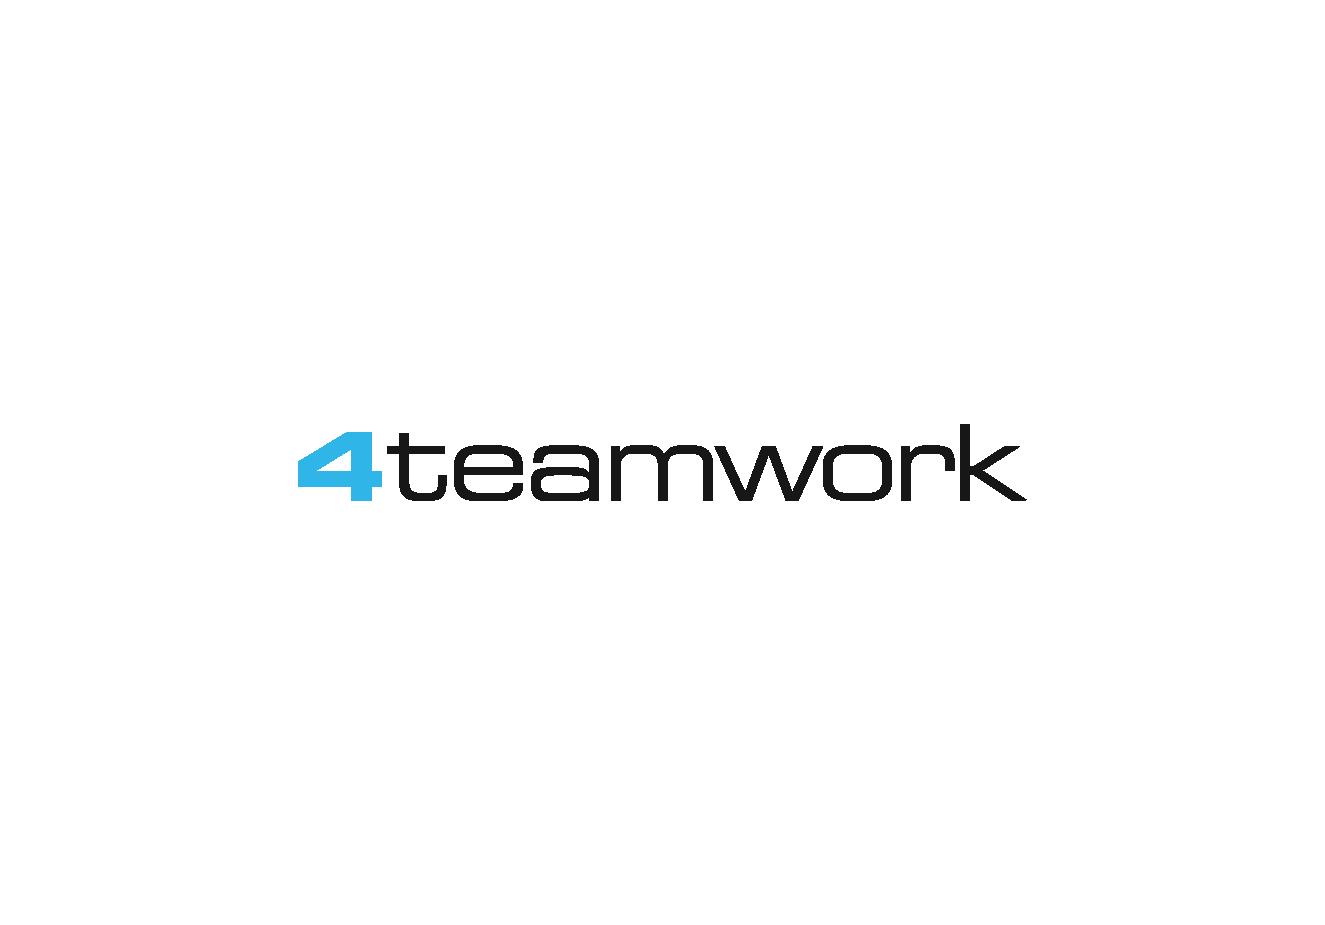 4teamwork